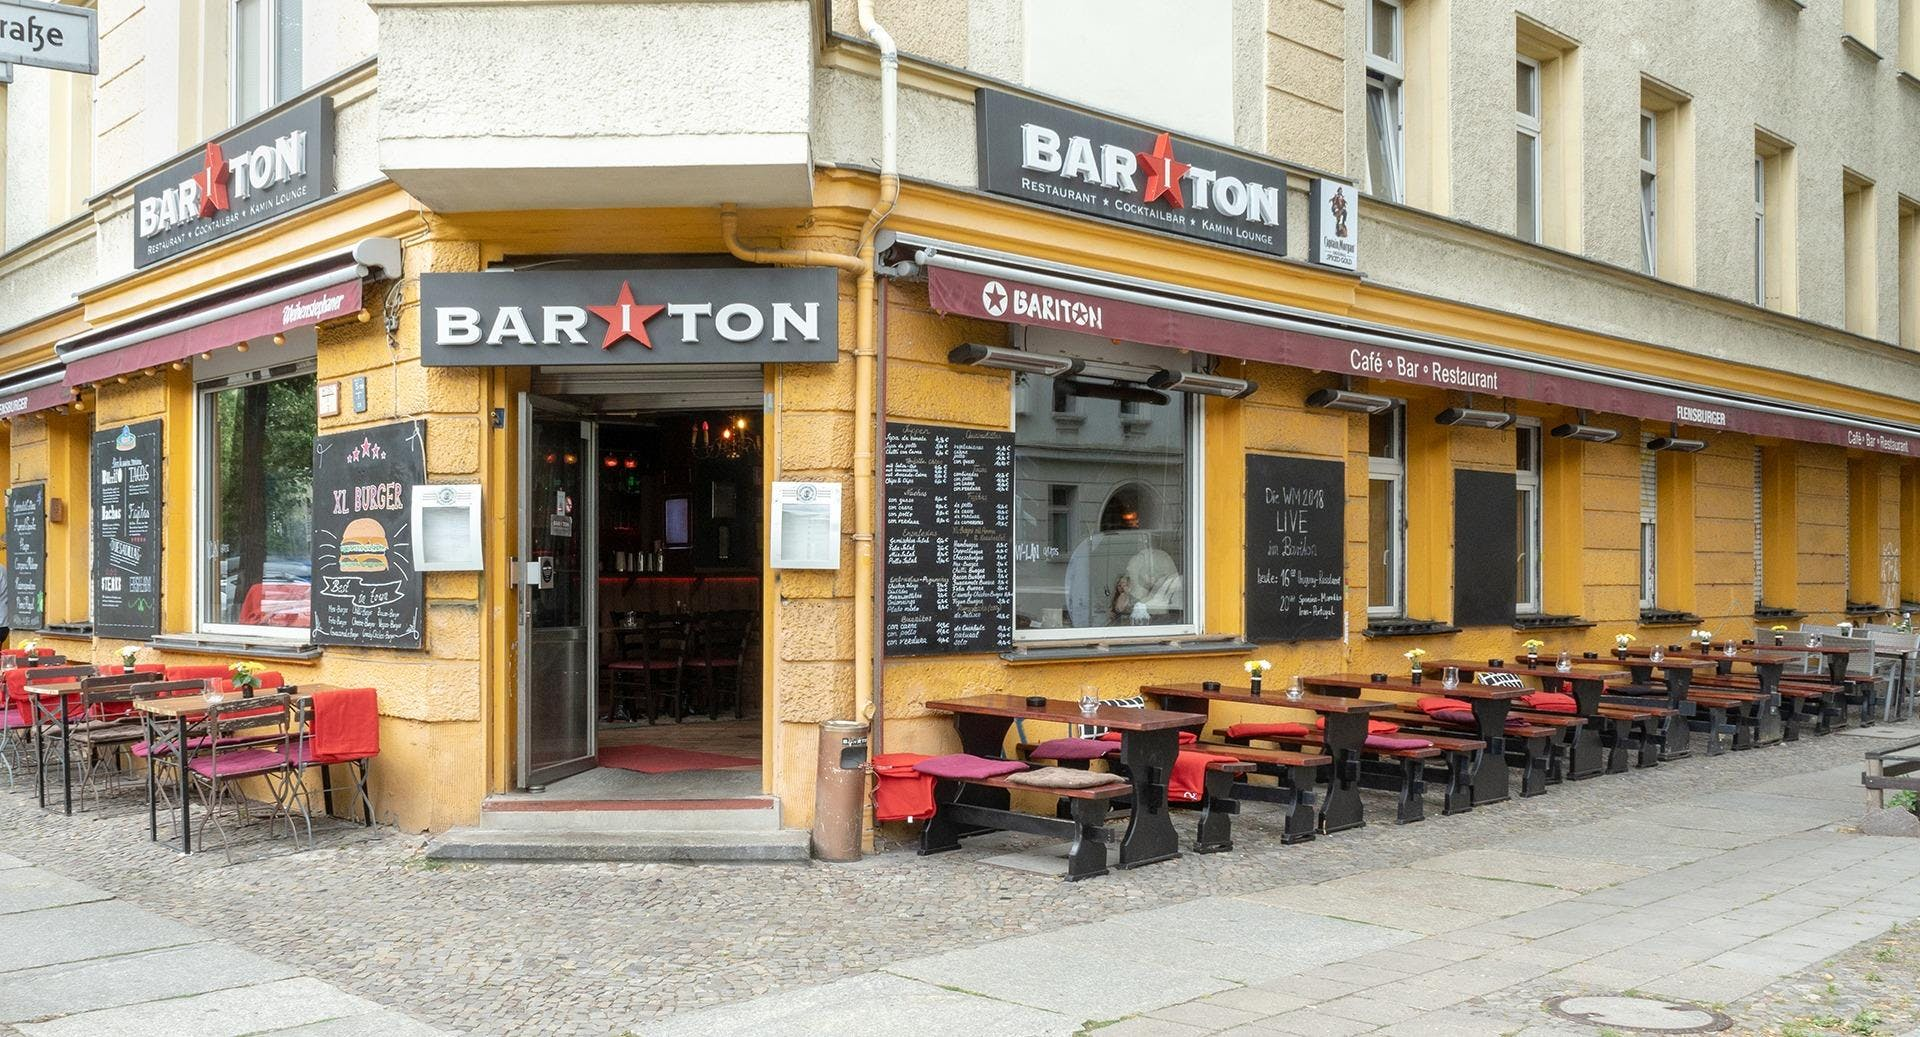 Bariton Berlin image 2